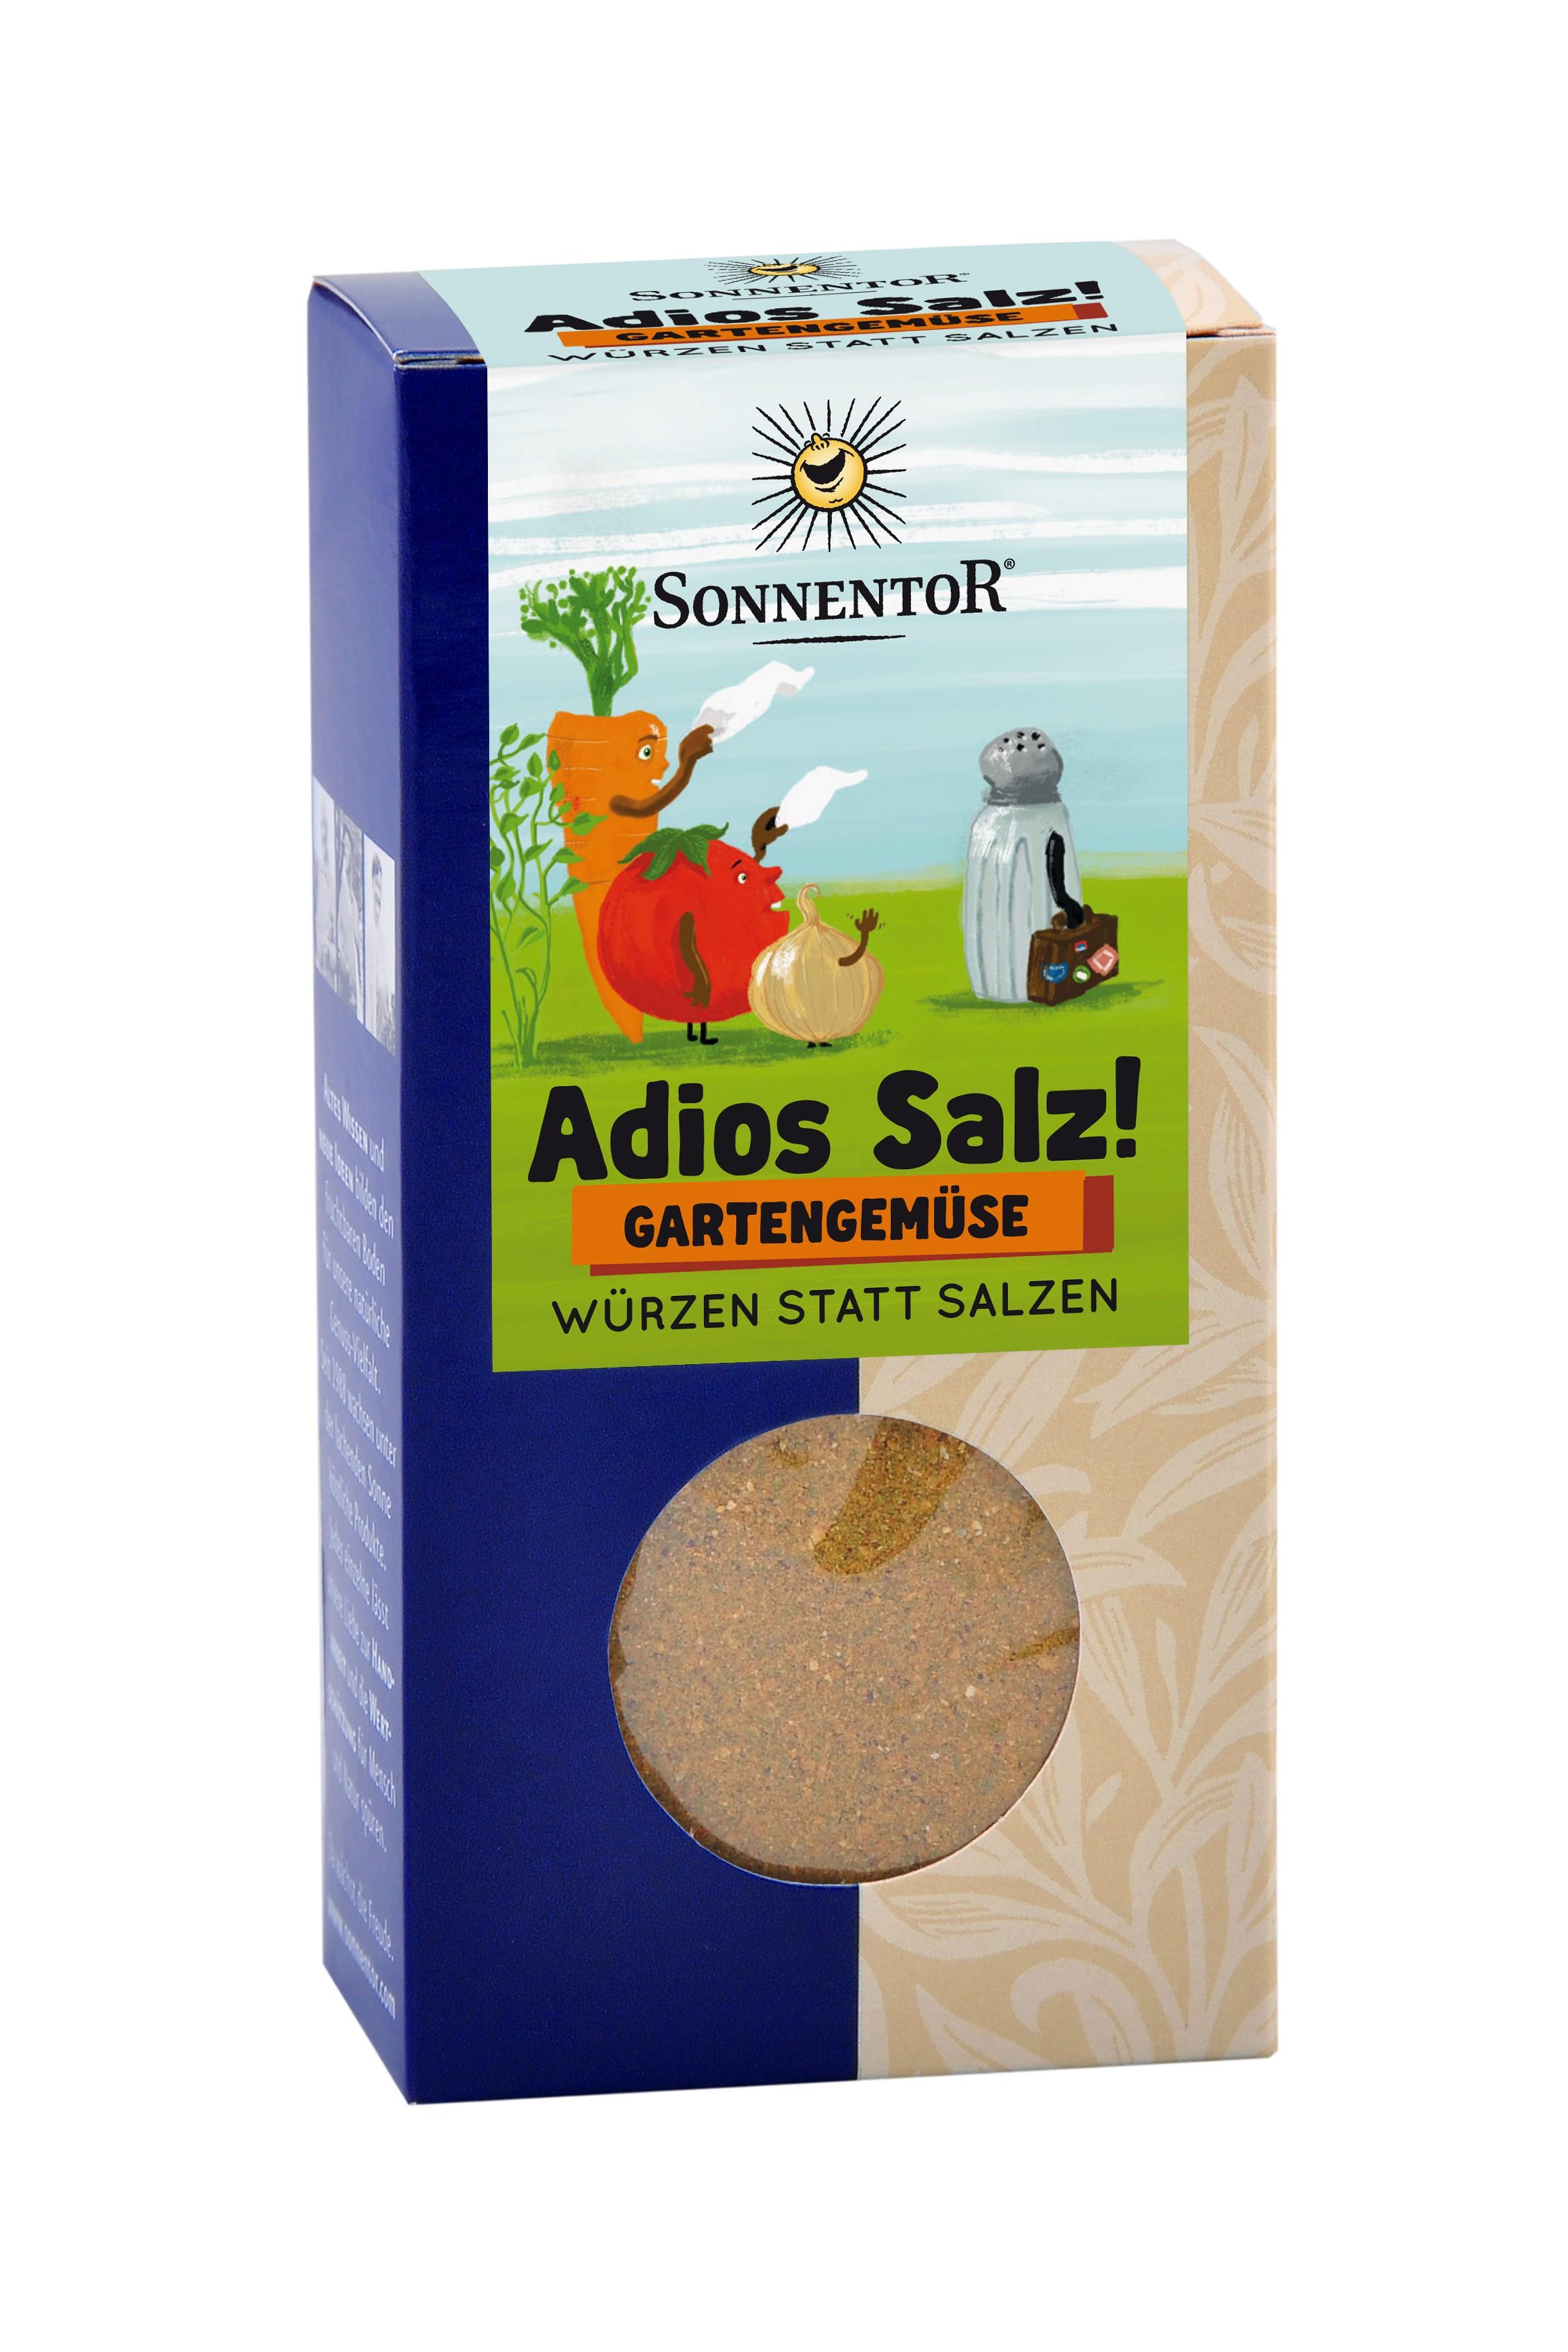 Adios Salz! Gartengemüse Mischung bio, 60g